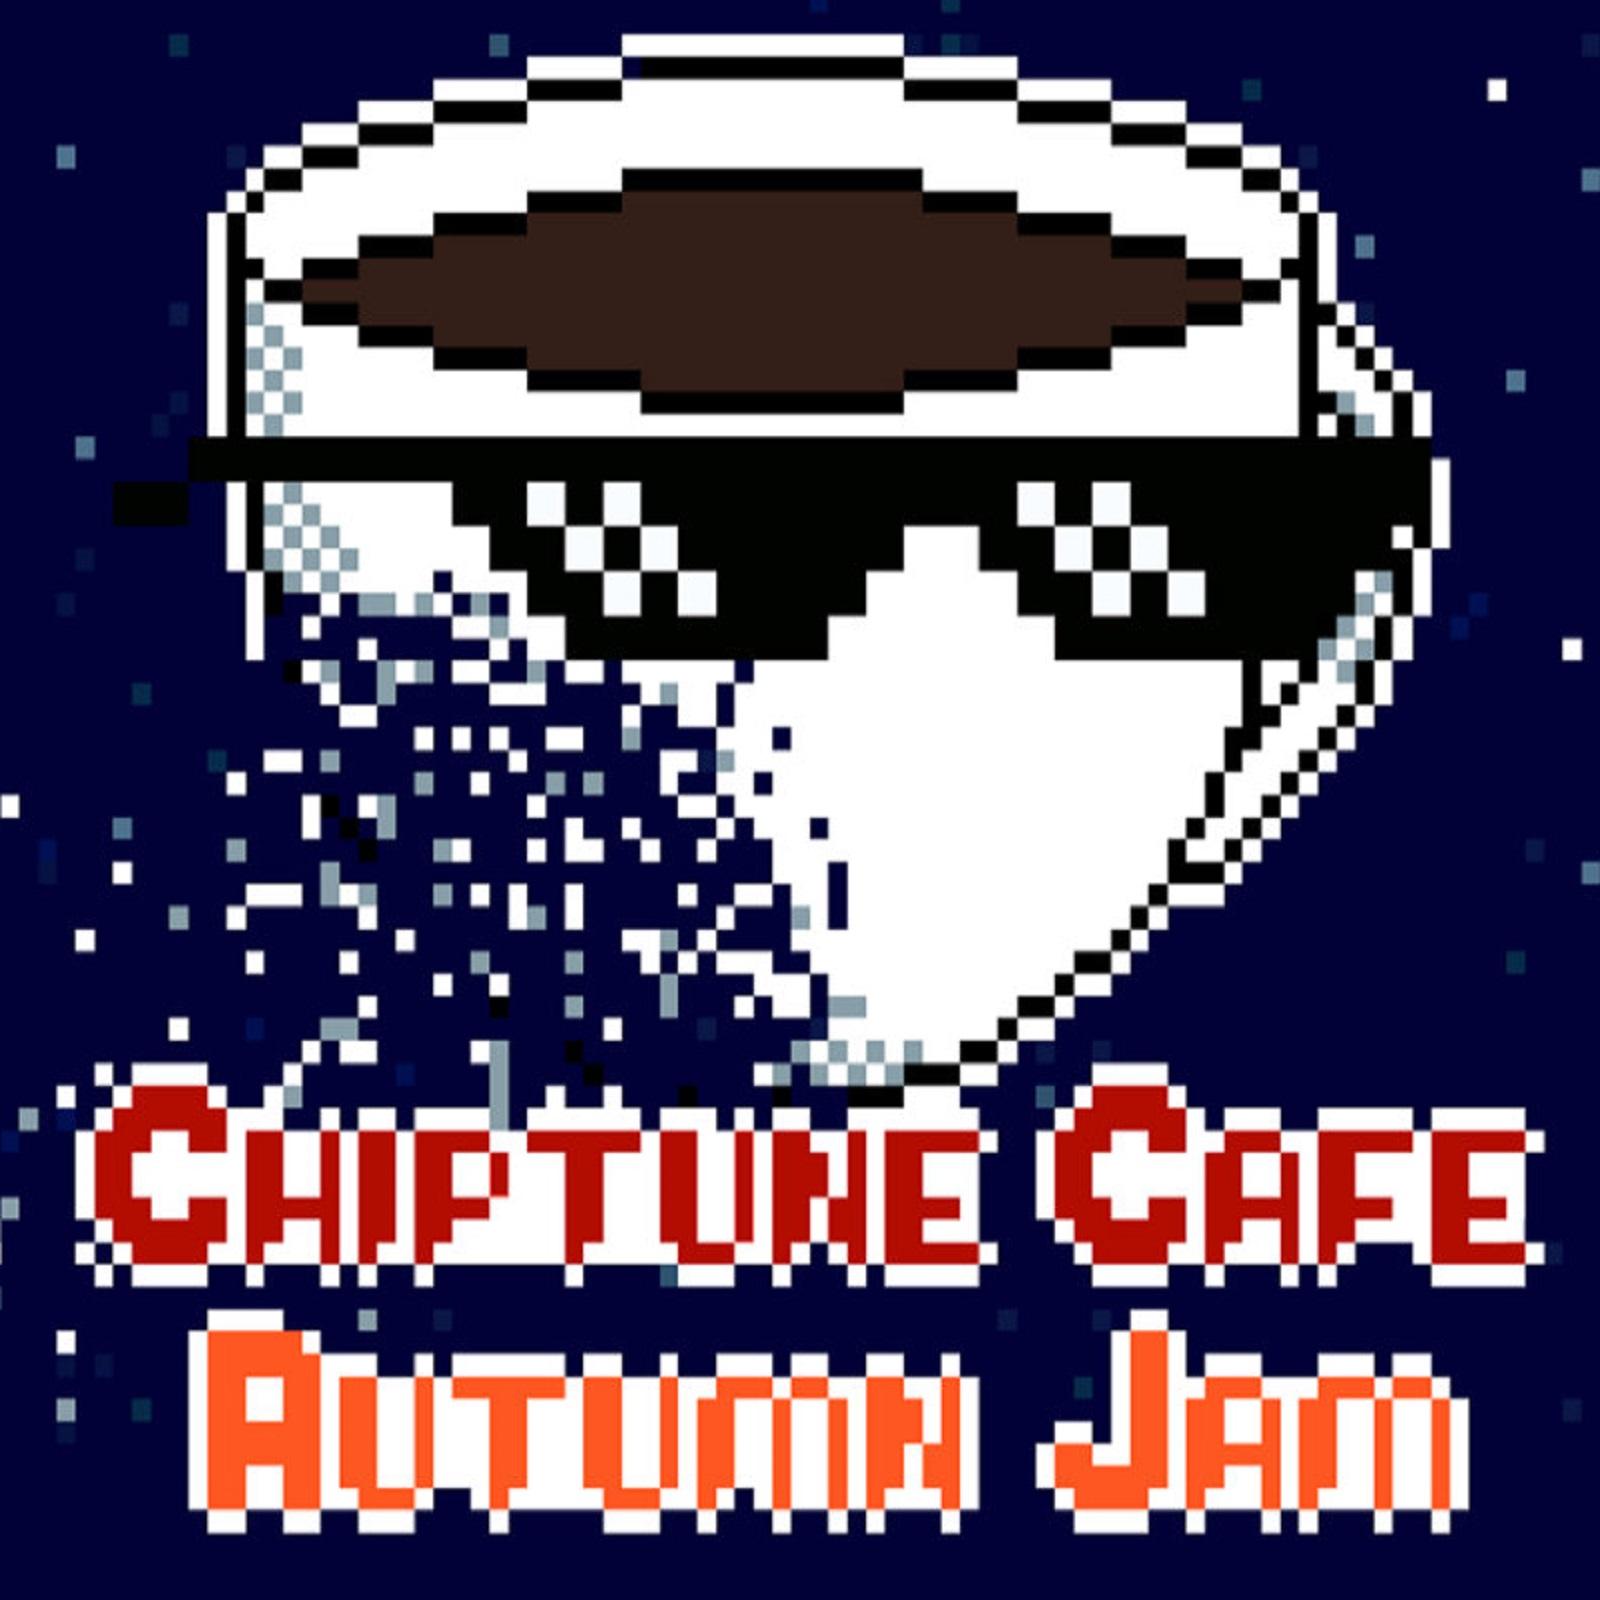 Autumn Jam Album Art created by Ravancloak.